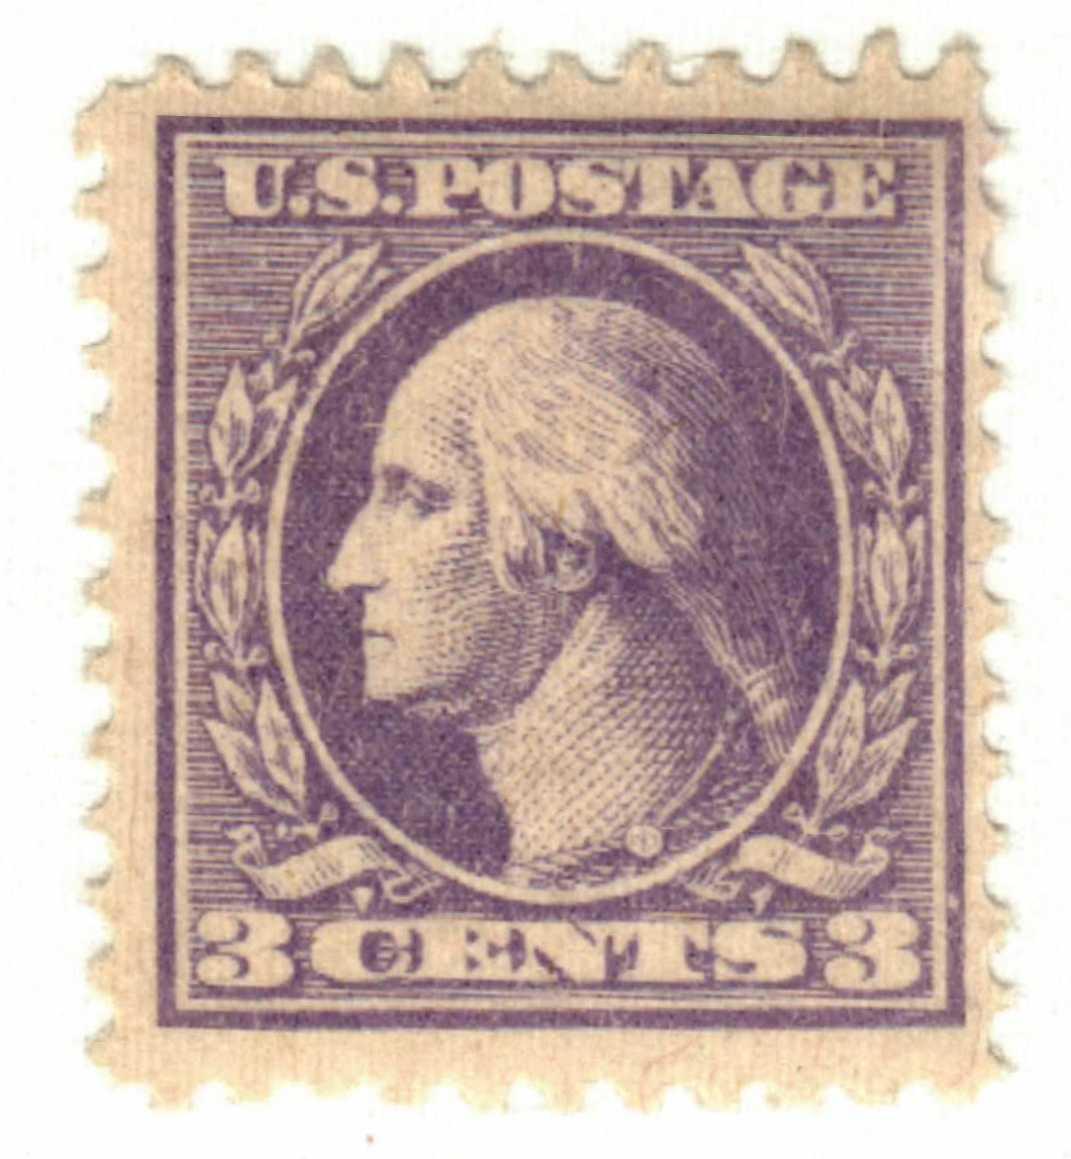 1918 3c Washington, violet, perf 11, type III